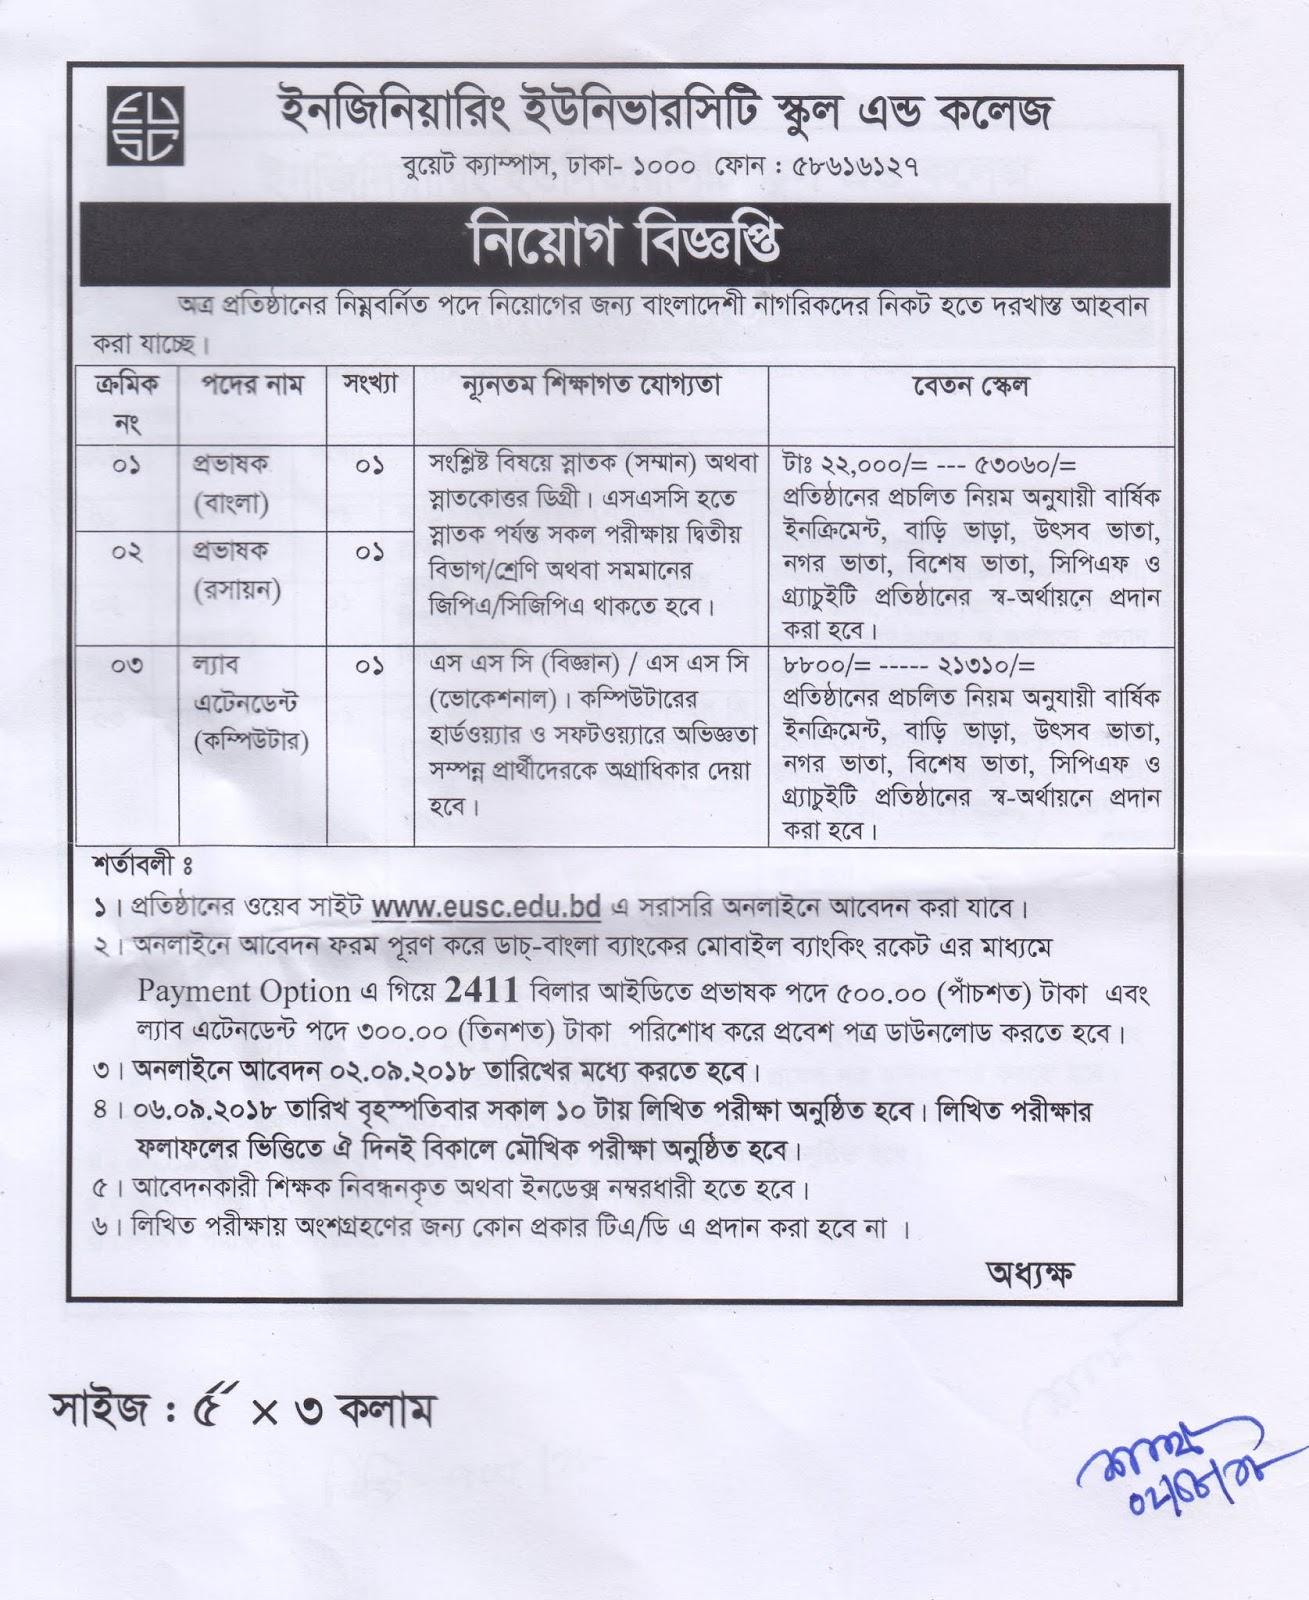 Engineering University School and College Job Circular 2018